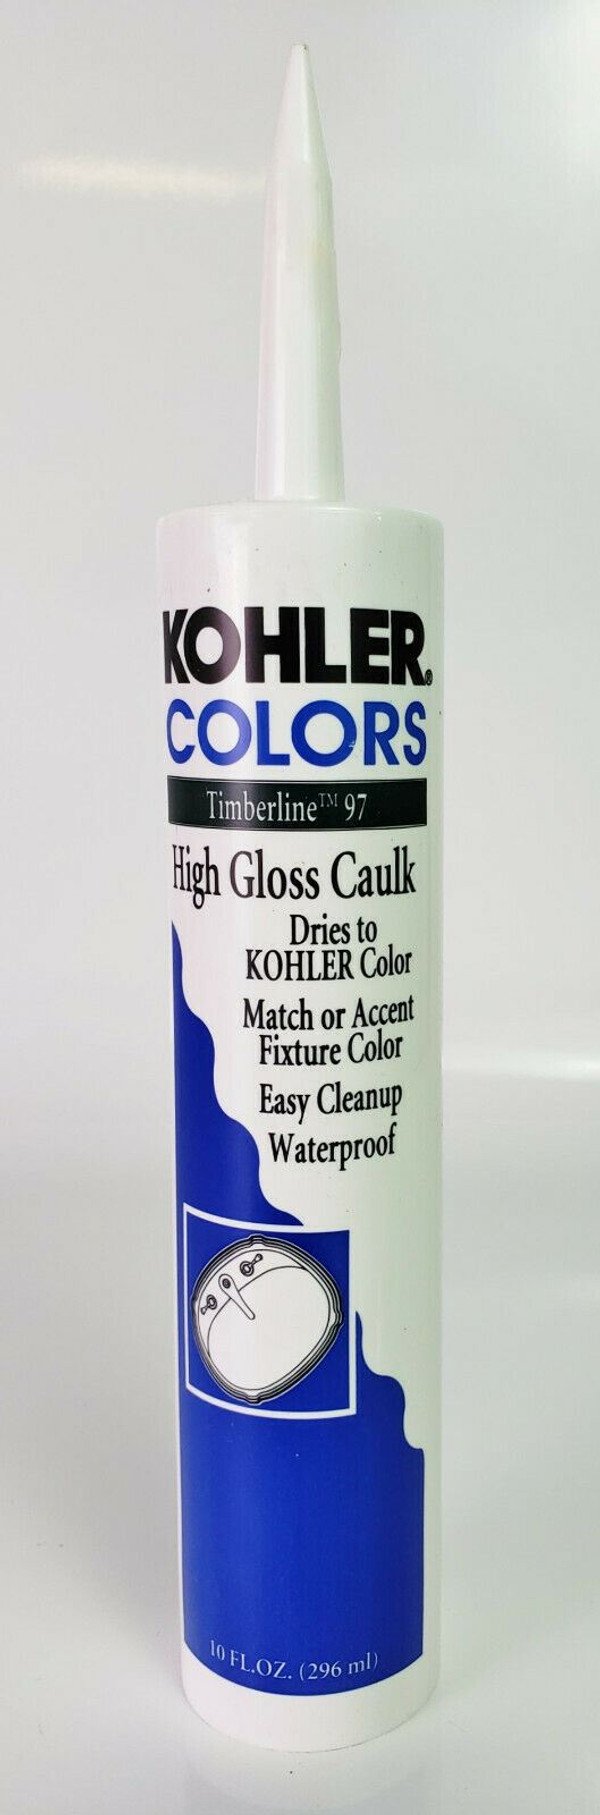 KOHLER COLORS CAULK Timberline 97 High Gloss Matches Kohler Fixture Color RARE!